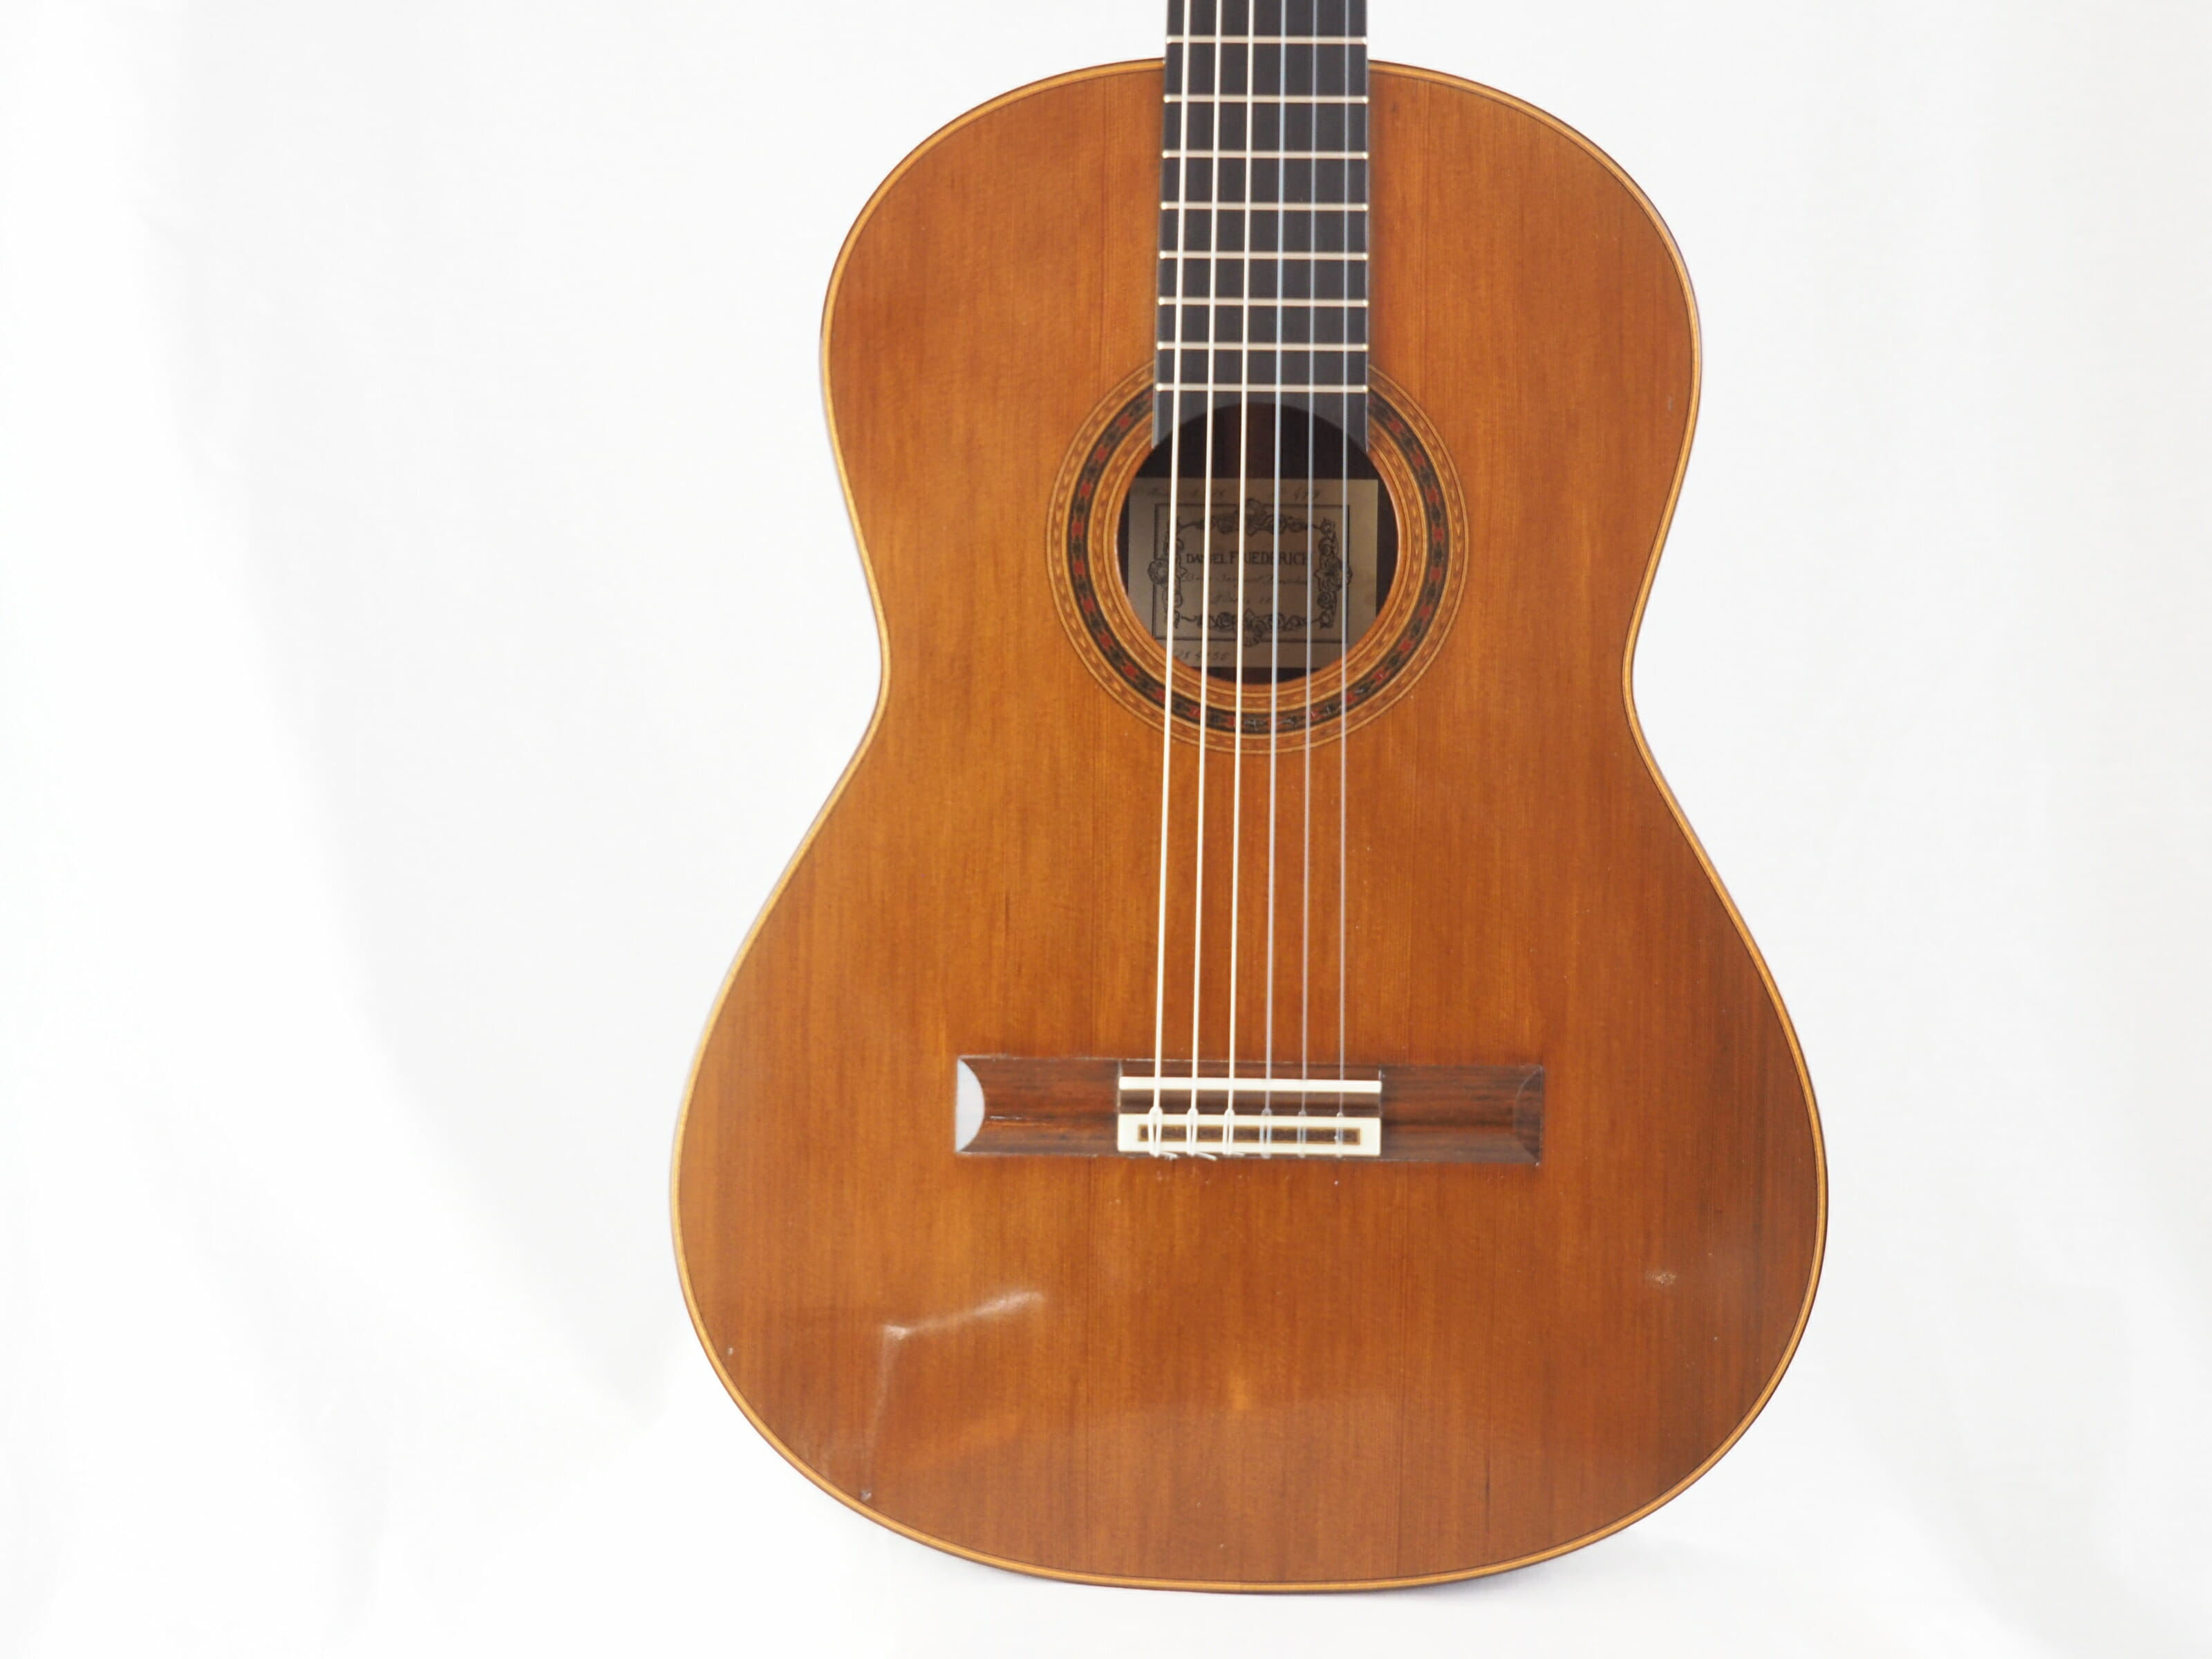 Daniel Friederich luthier guitare classique No 19FRI479-09